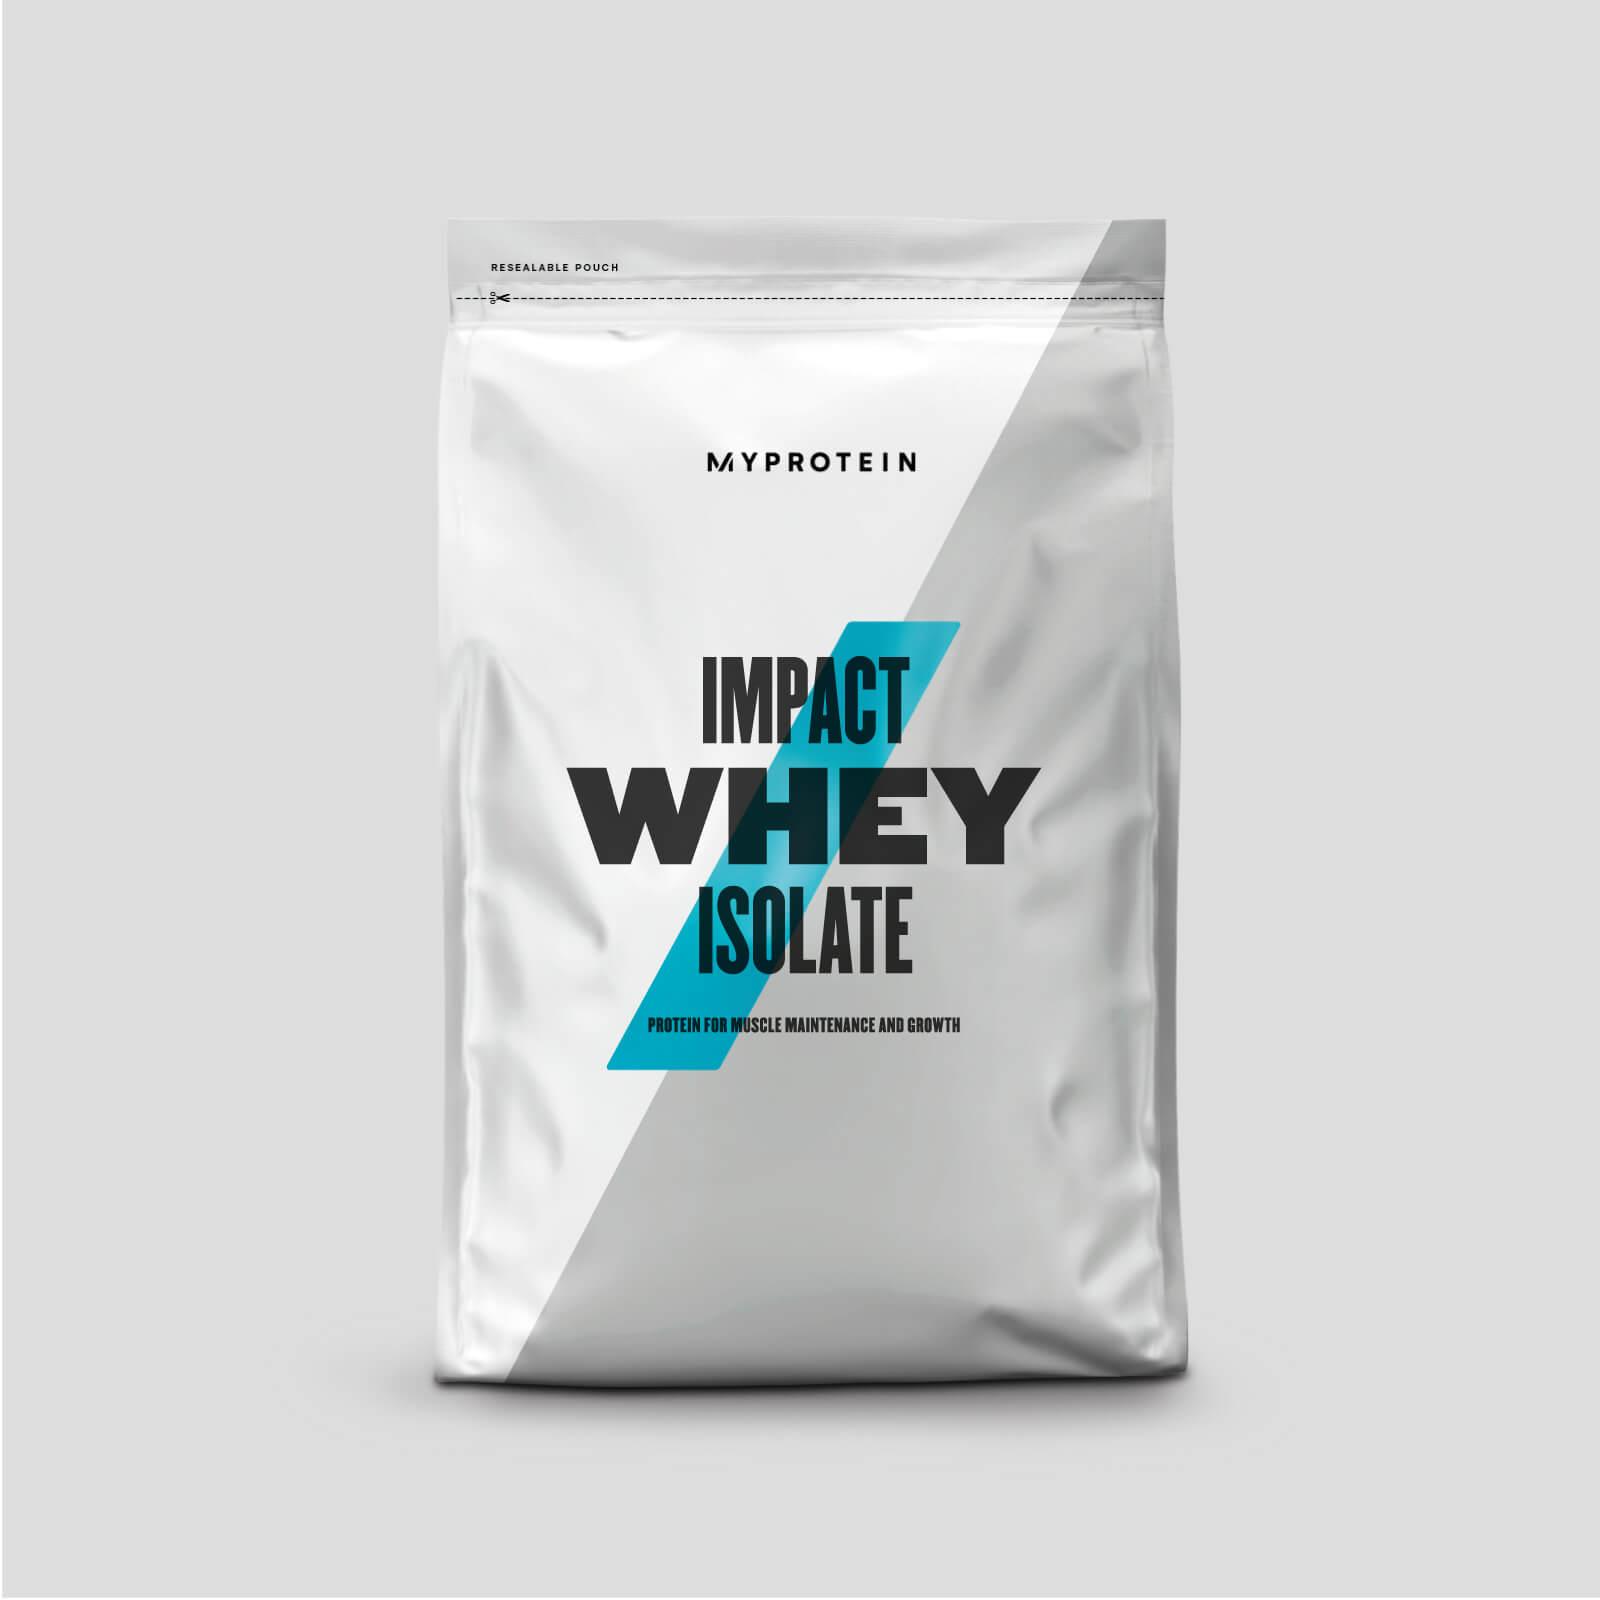 Myprotein Impact Whey Isolate - 2.5kg - Chocolat Caramel